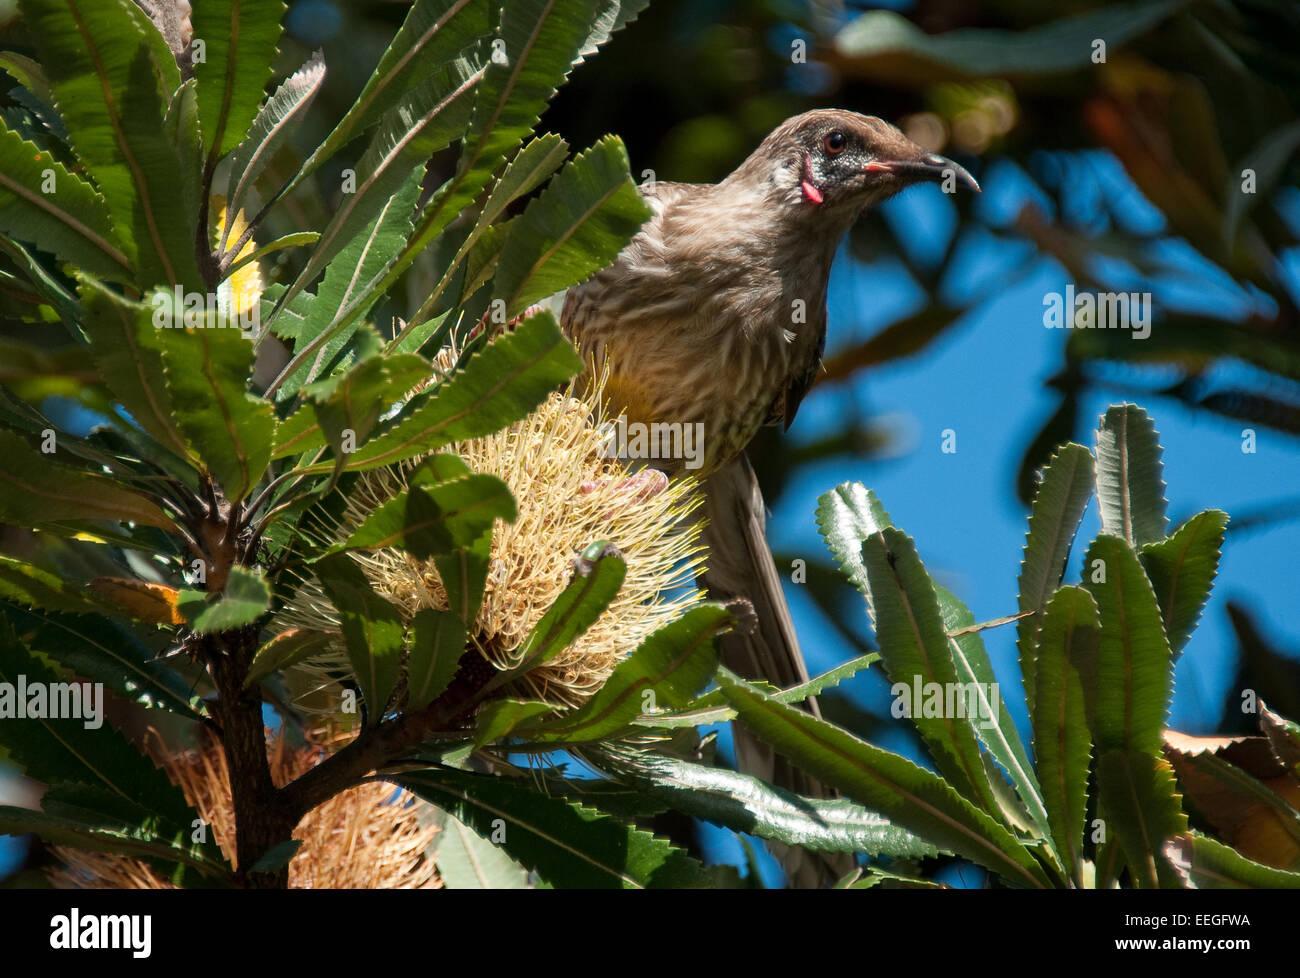 Red Wattlebird (Anthochaera carunculata) - Stock Image